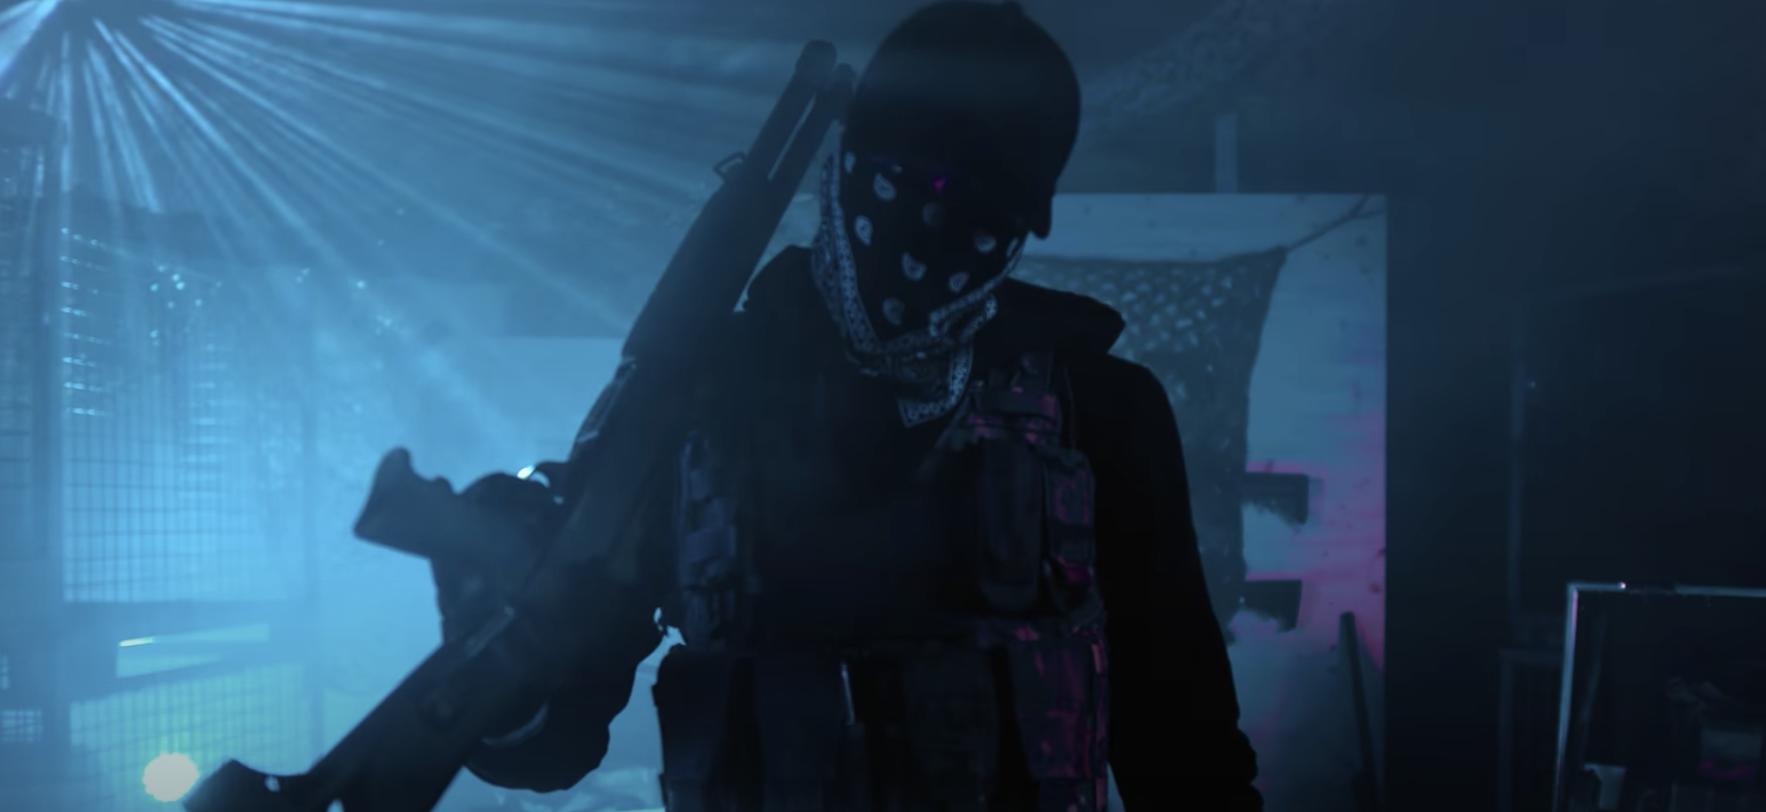 AK Ausserkontrolle - Kristall 2 (Video) |16BARS